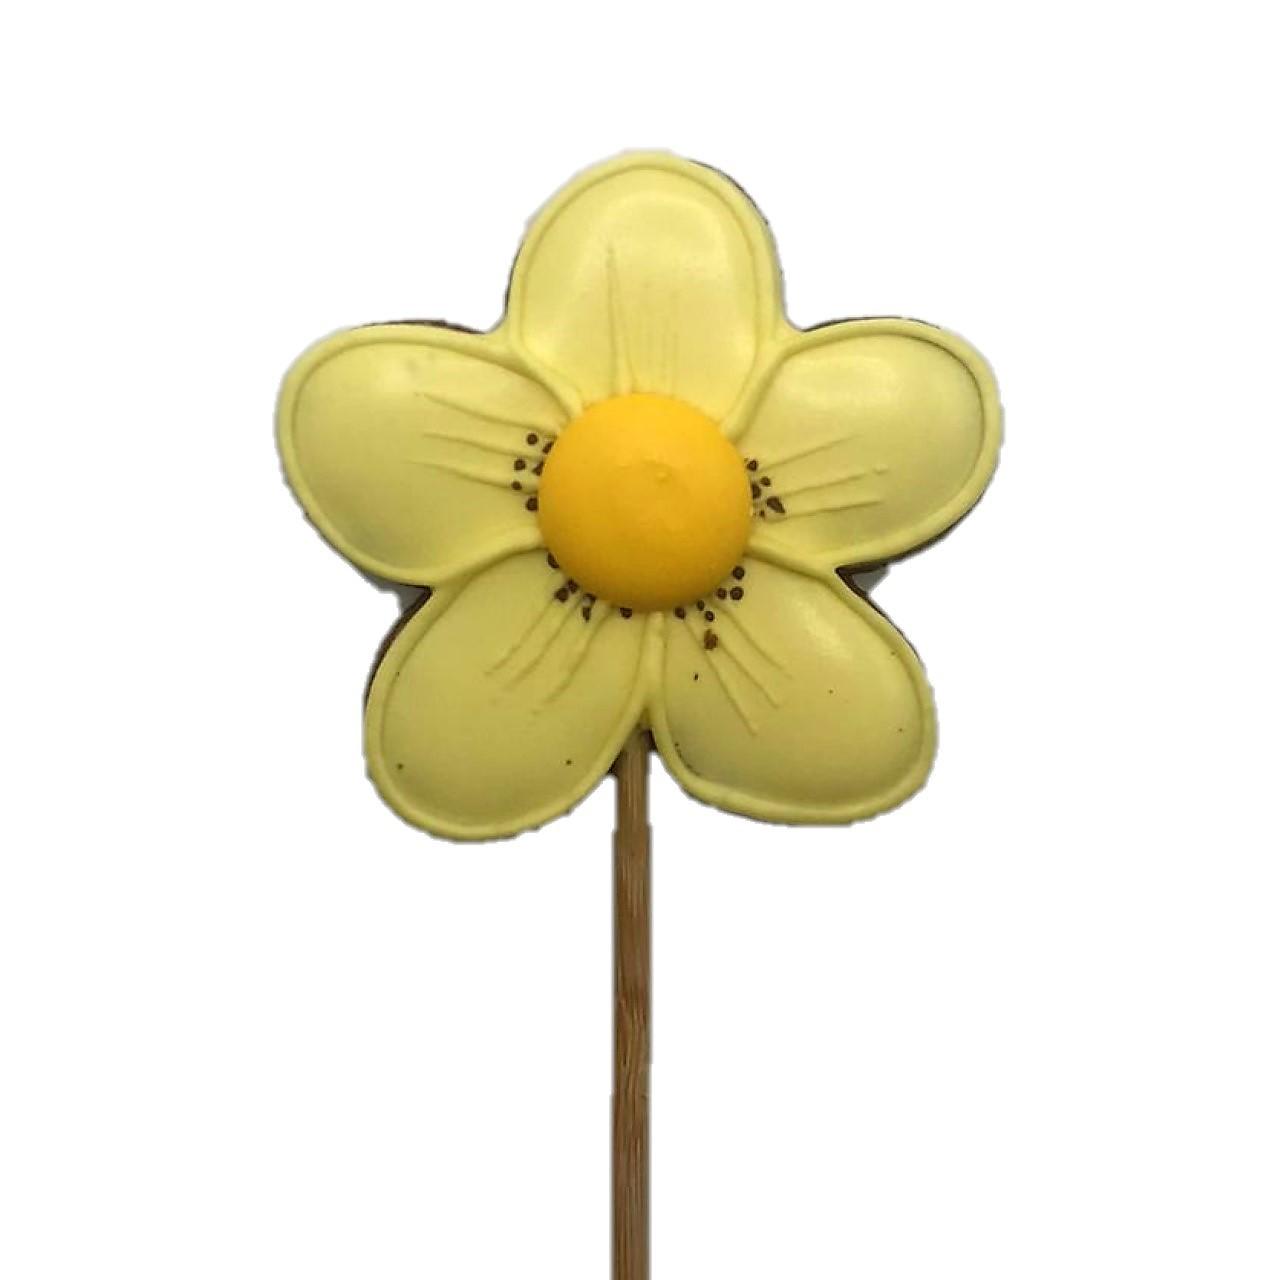 Pirulito de Bolacha de Mel Amarela Flor